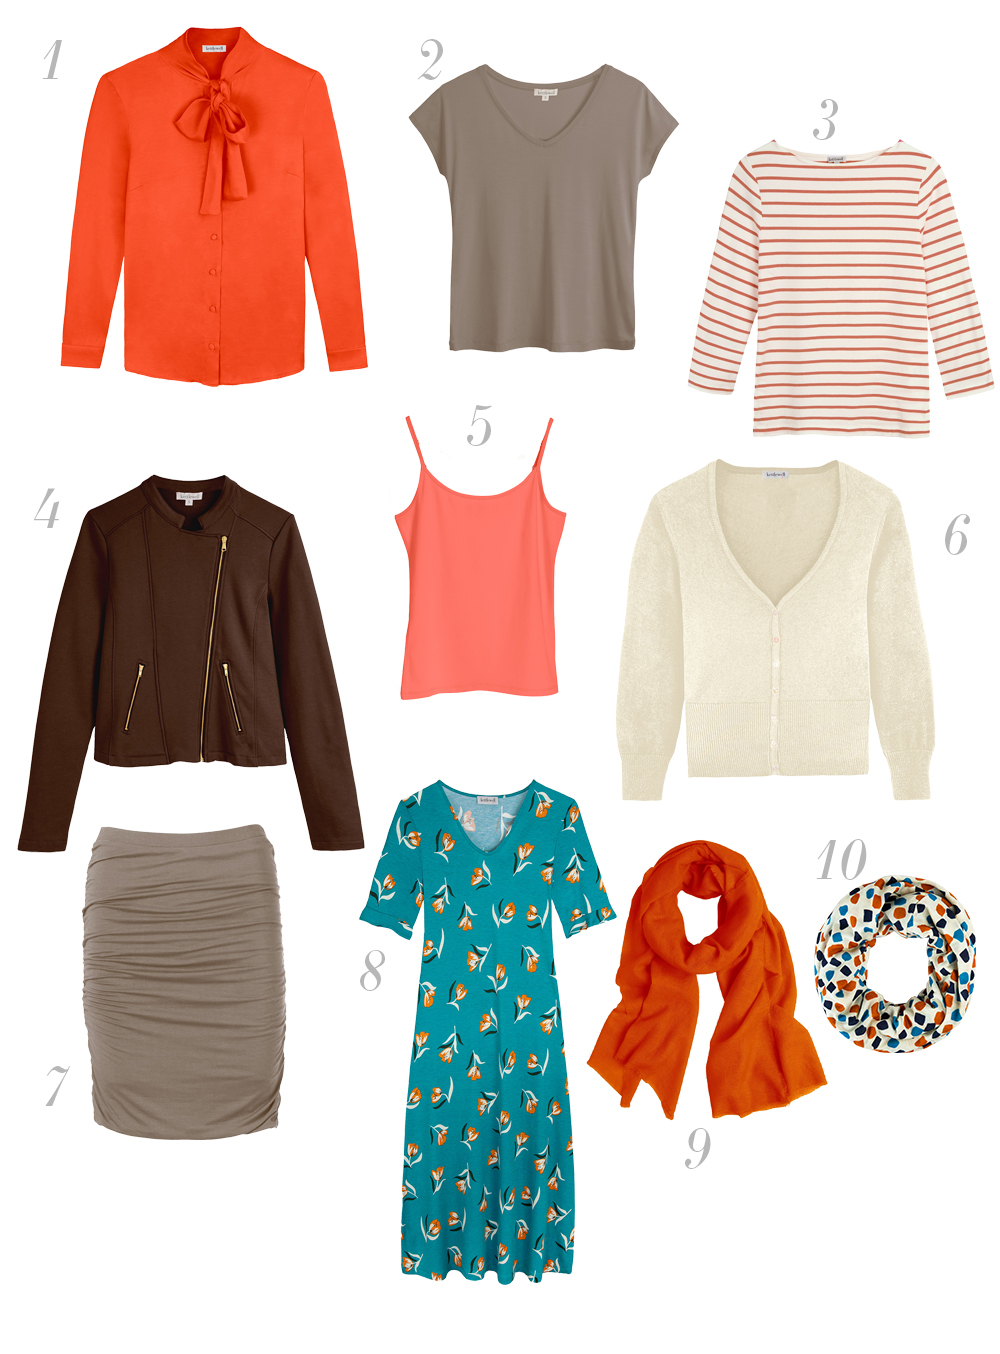 raw-autumn_items.jpg